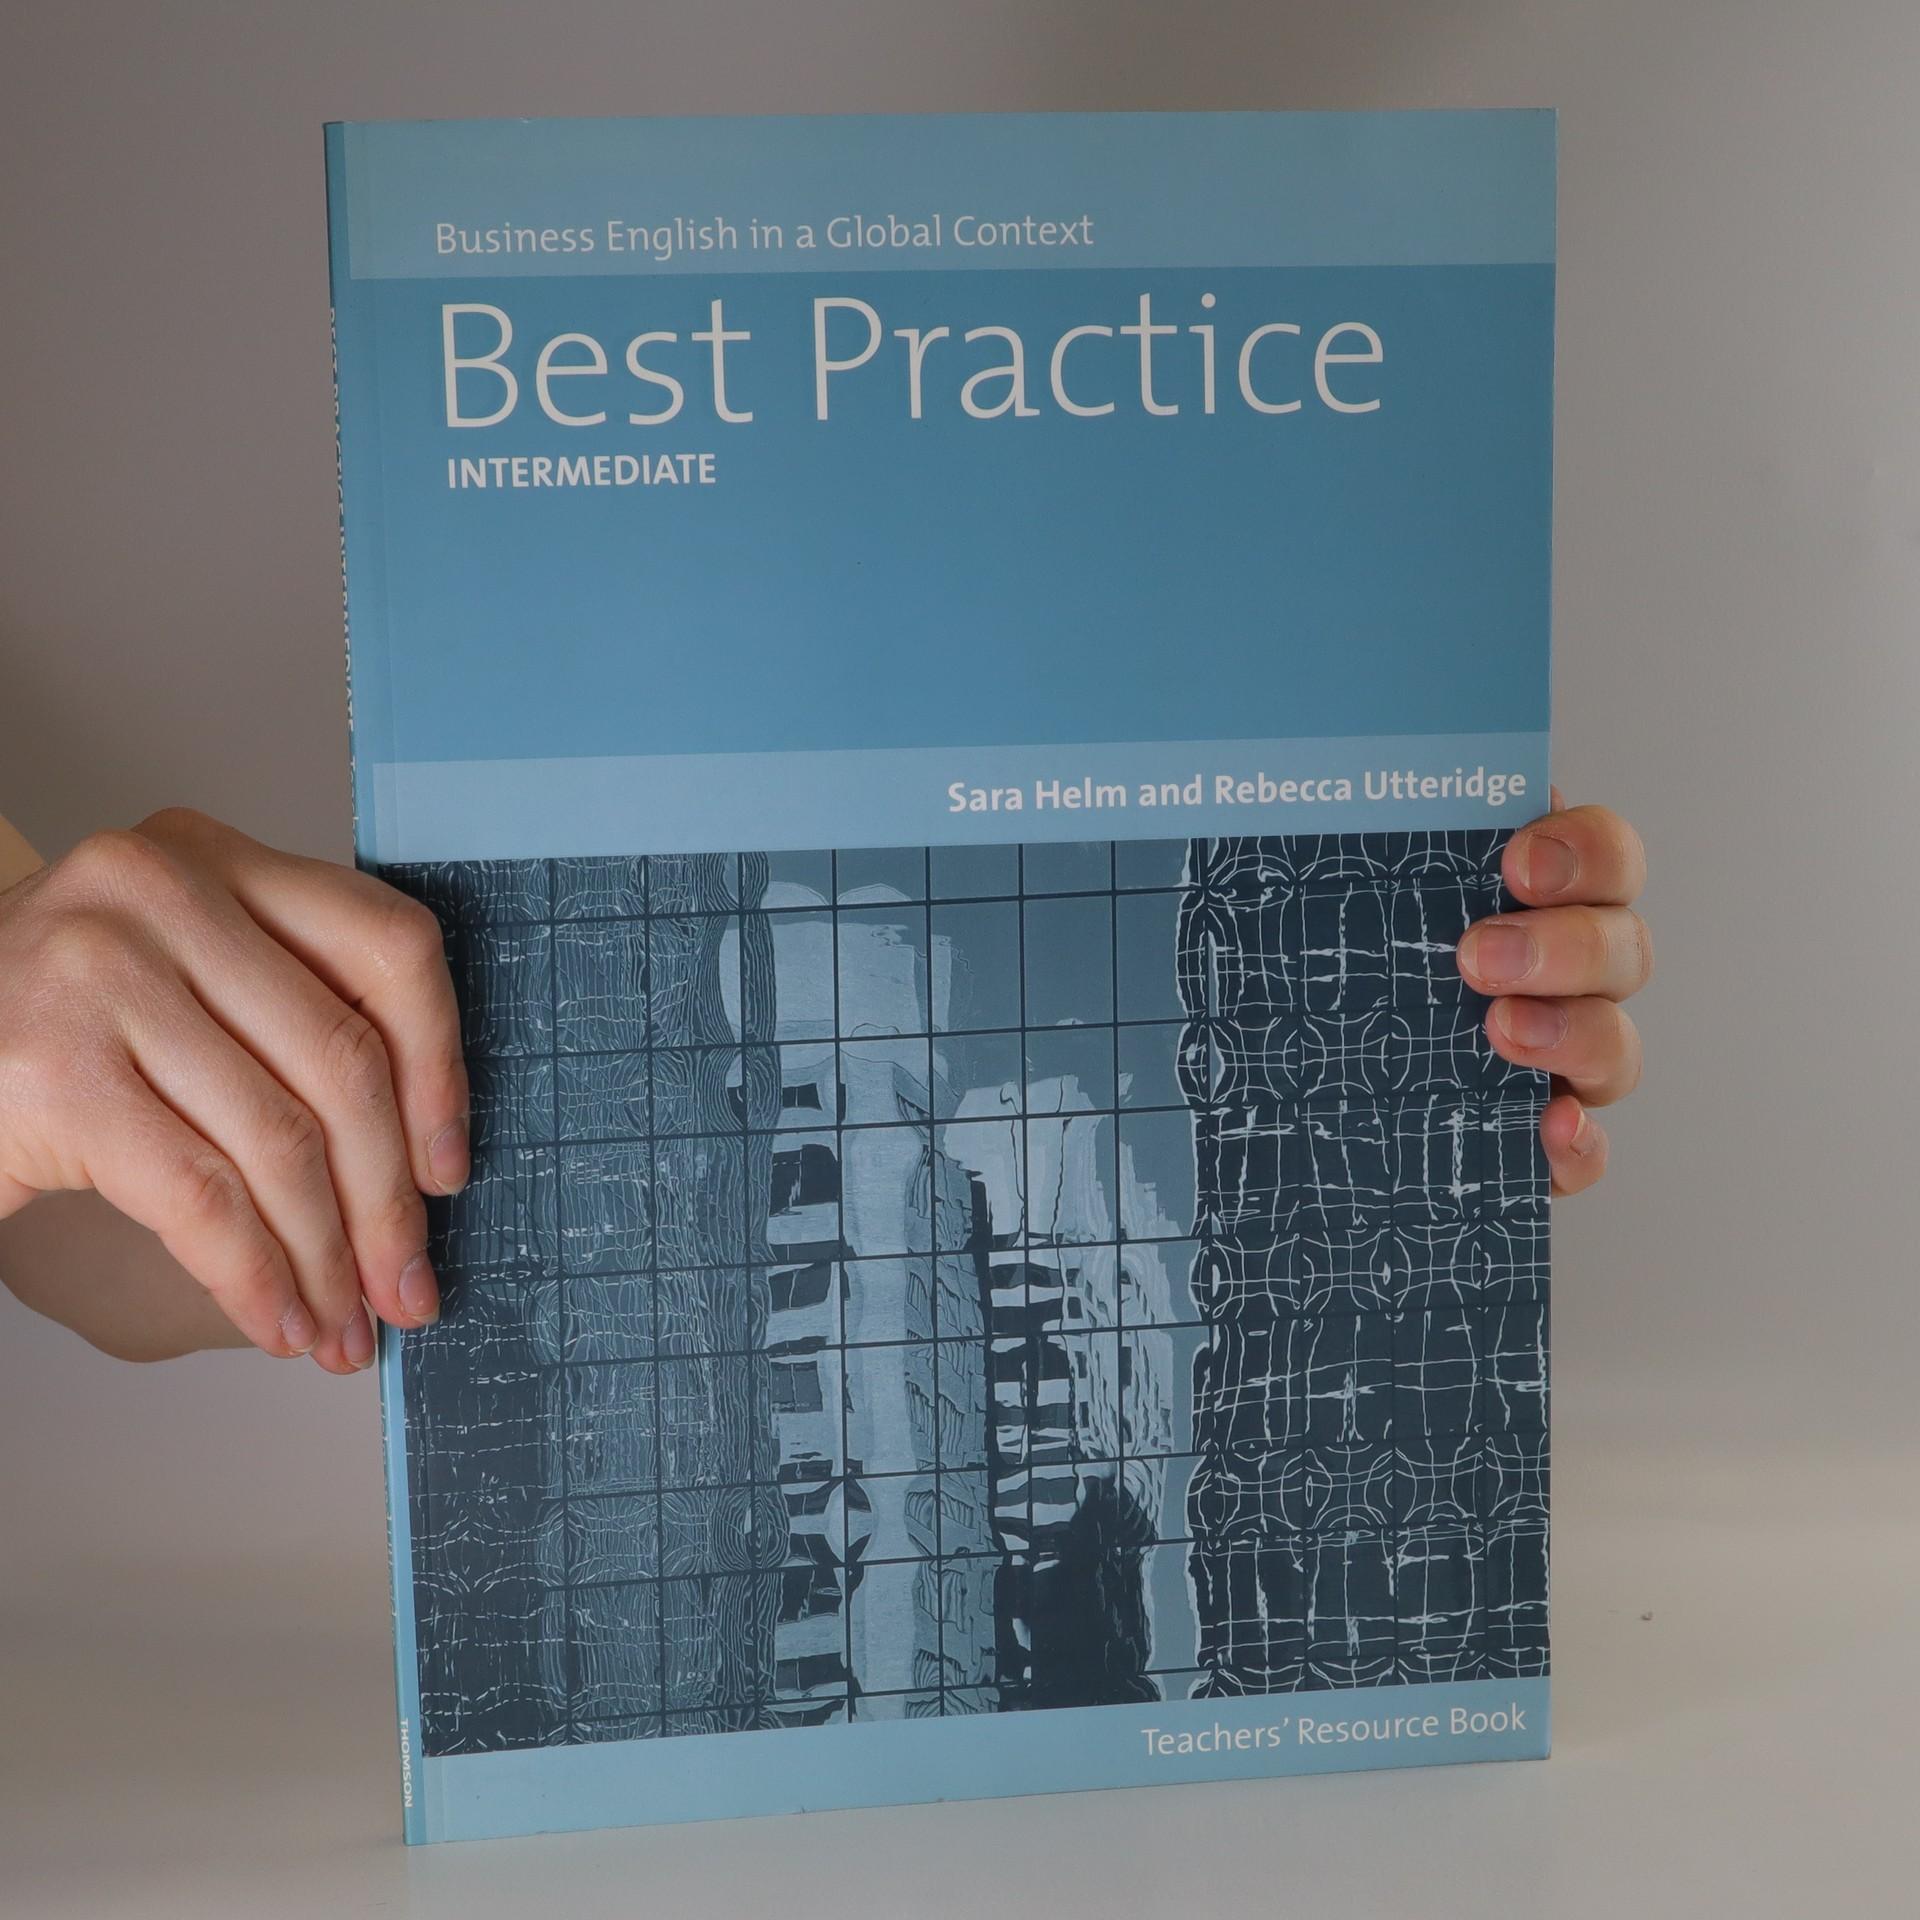 antikvární kniha Best Practice. Intermediate. Business English in a Global Context. Teachers' Resource Book, 2007